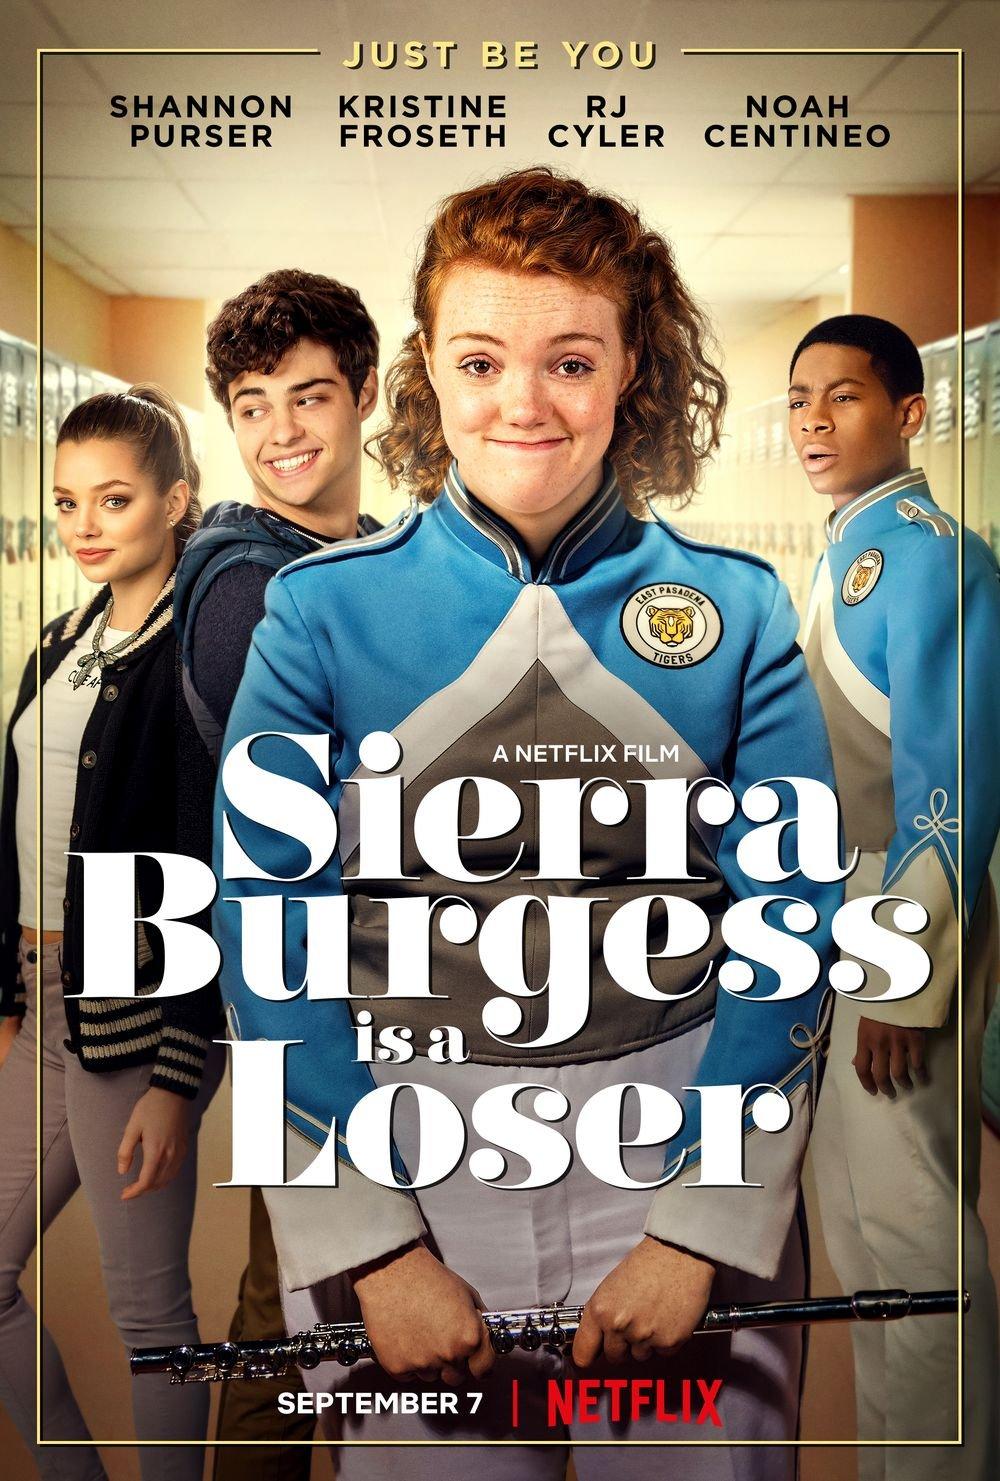 download Sierra.Burgess.Is.a.Loser.2018.German.DL.720p.WEB.x264.iNTERNAL-BiGiNT